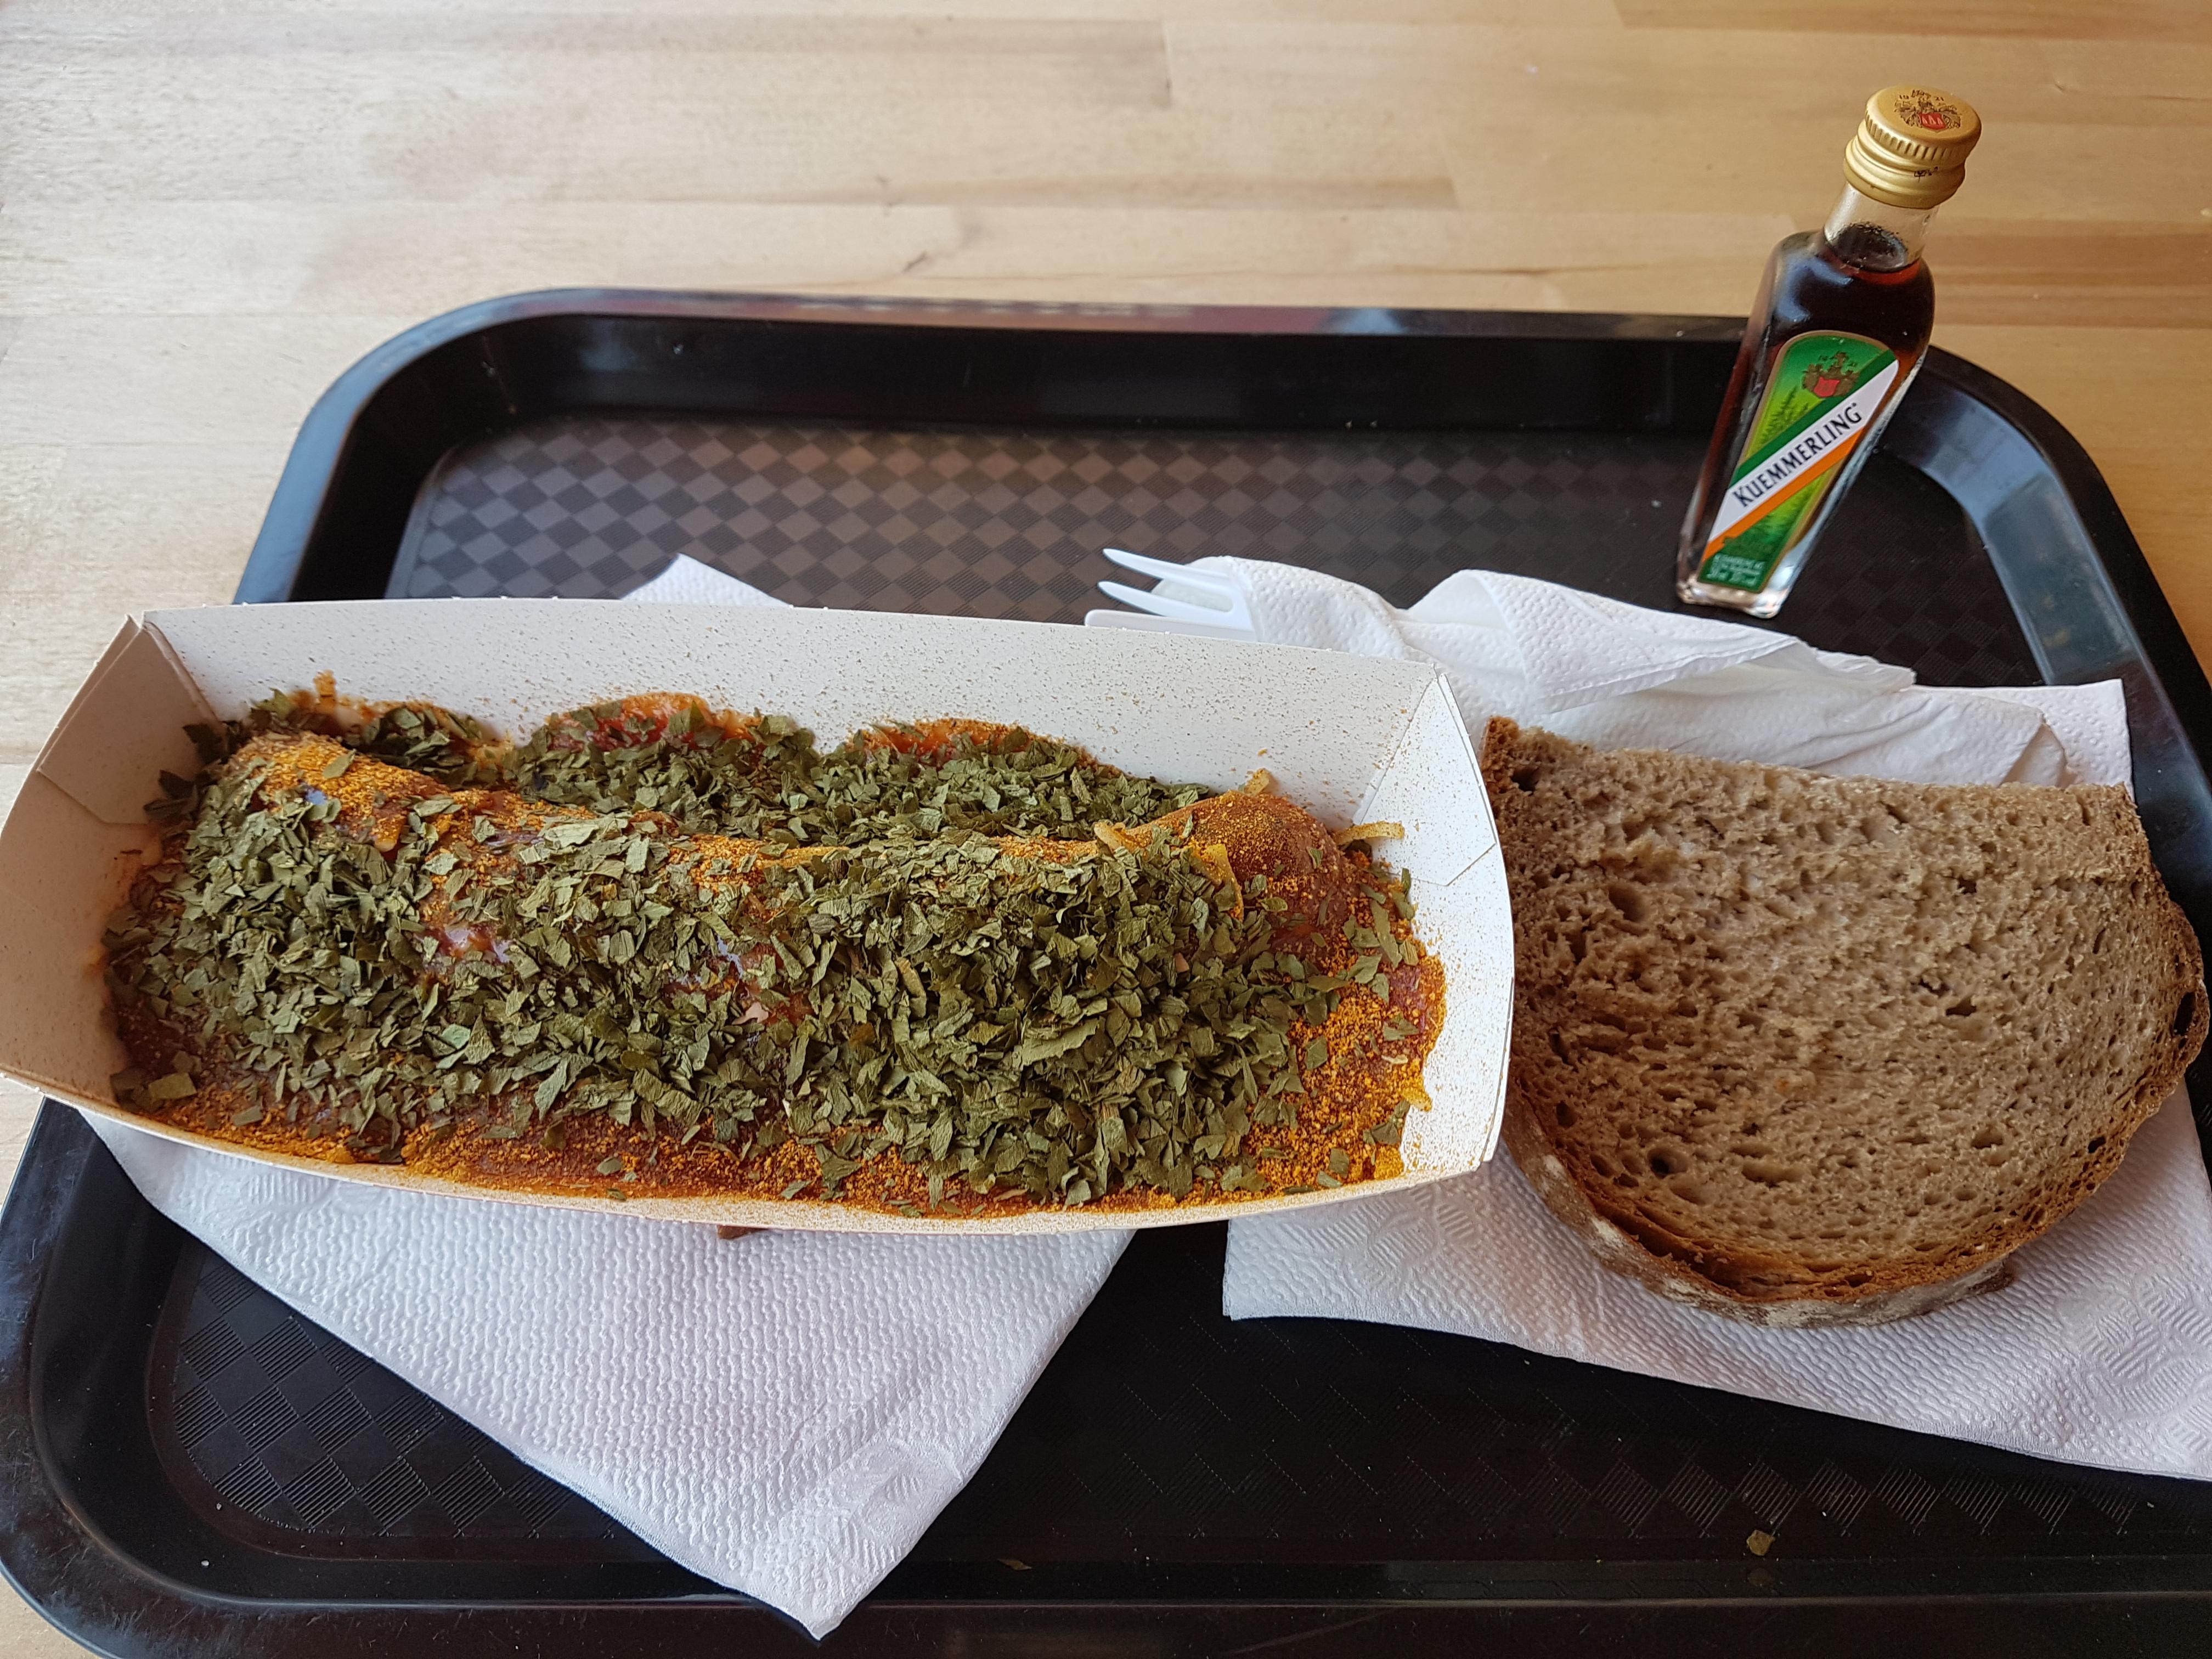 http://foodloader.net/Holz_2017-06-16_DJ_Duese_Wurst.jpg